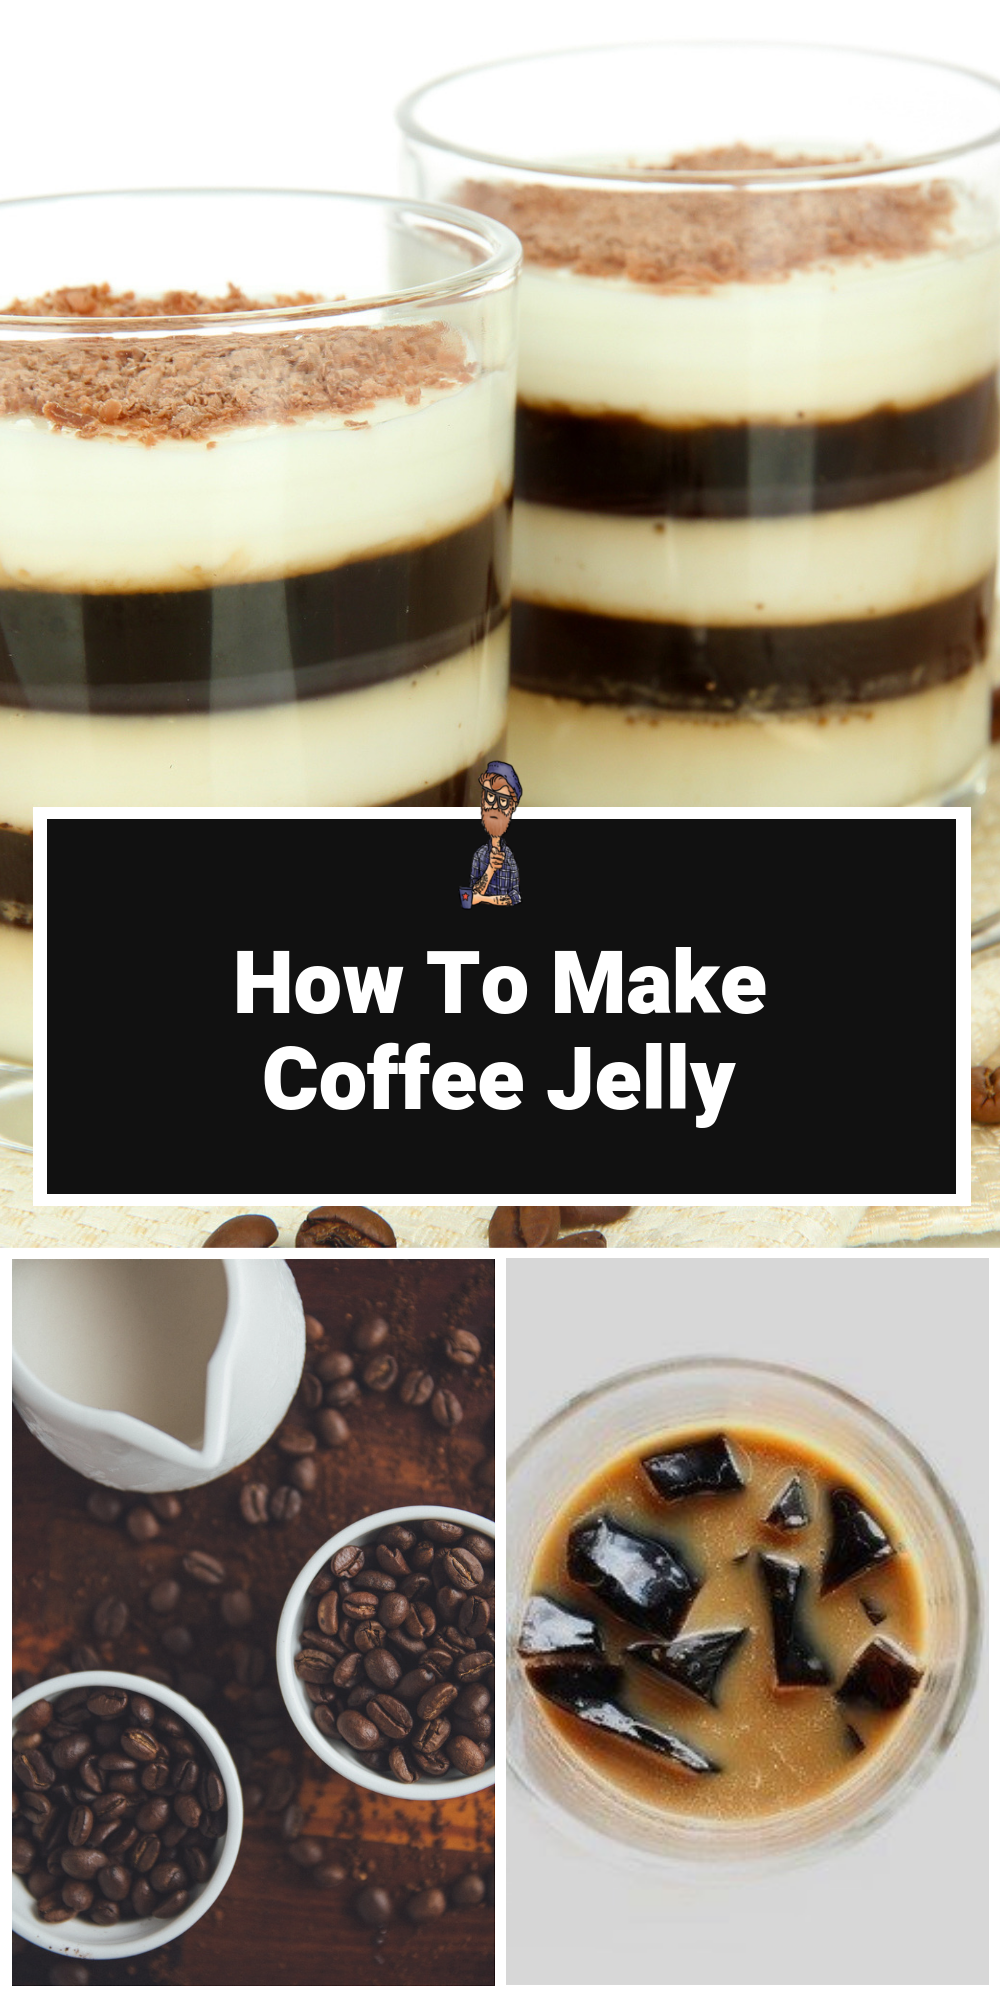 Coffee Jelly Recipe Jelly recipes, Coffee jelly